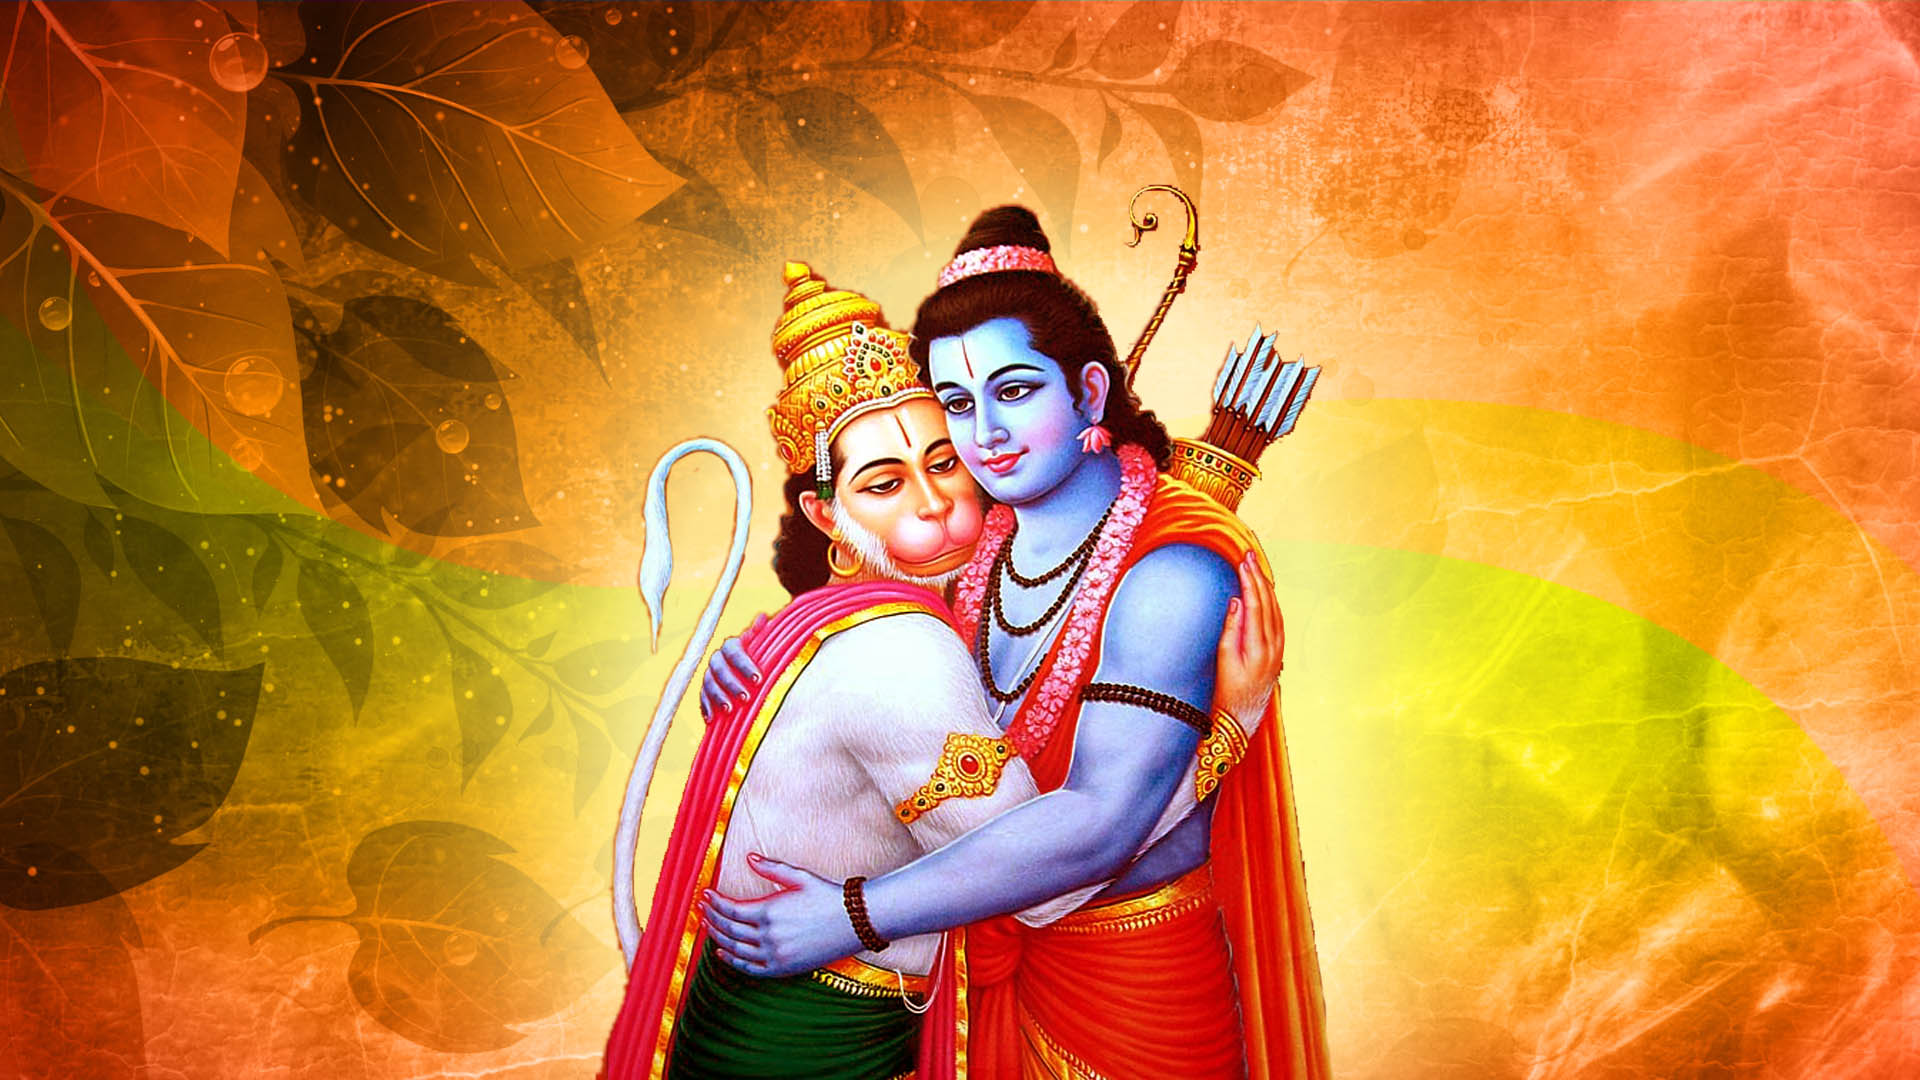 Hanuman ji ka upkar